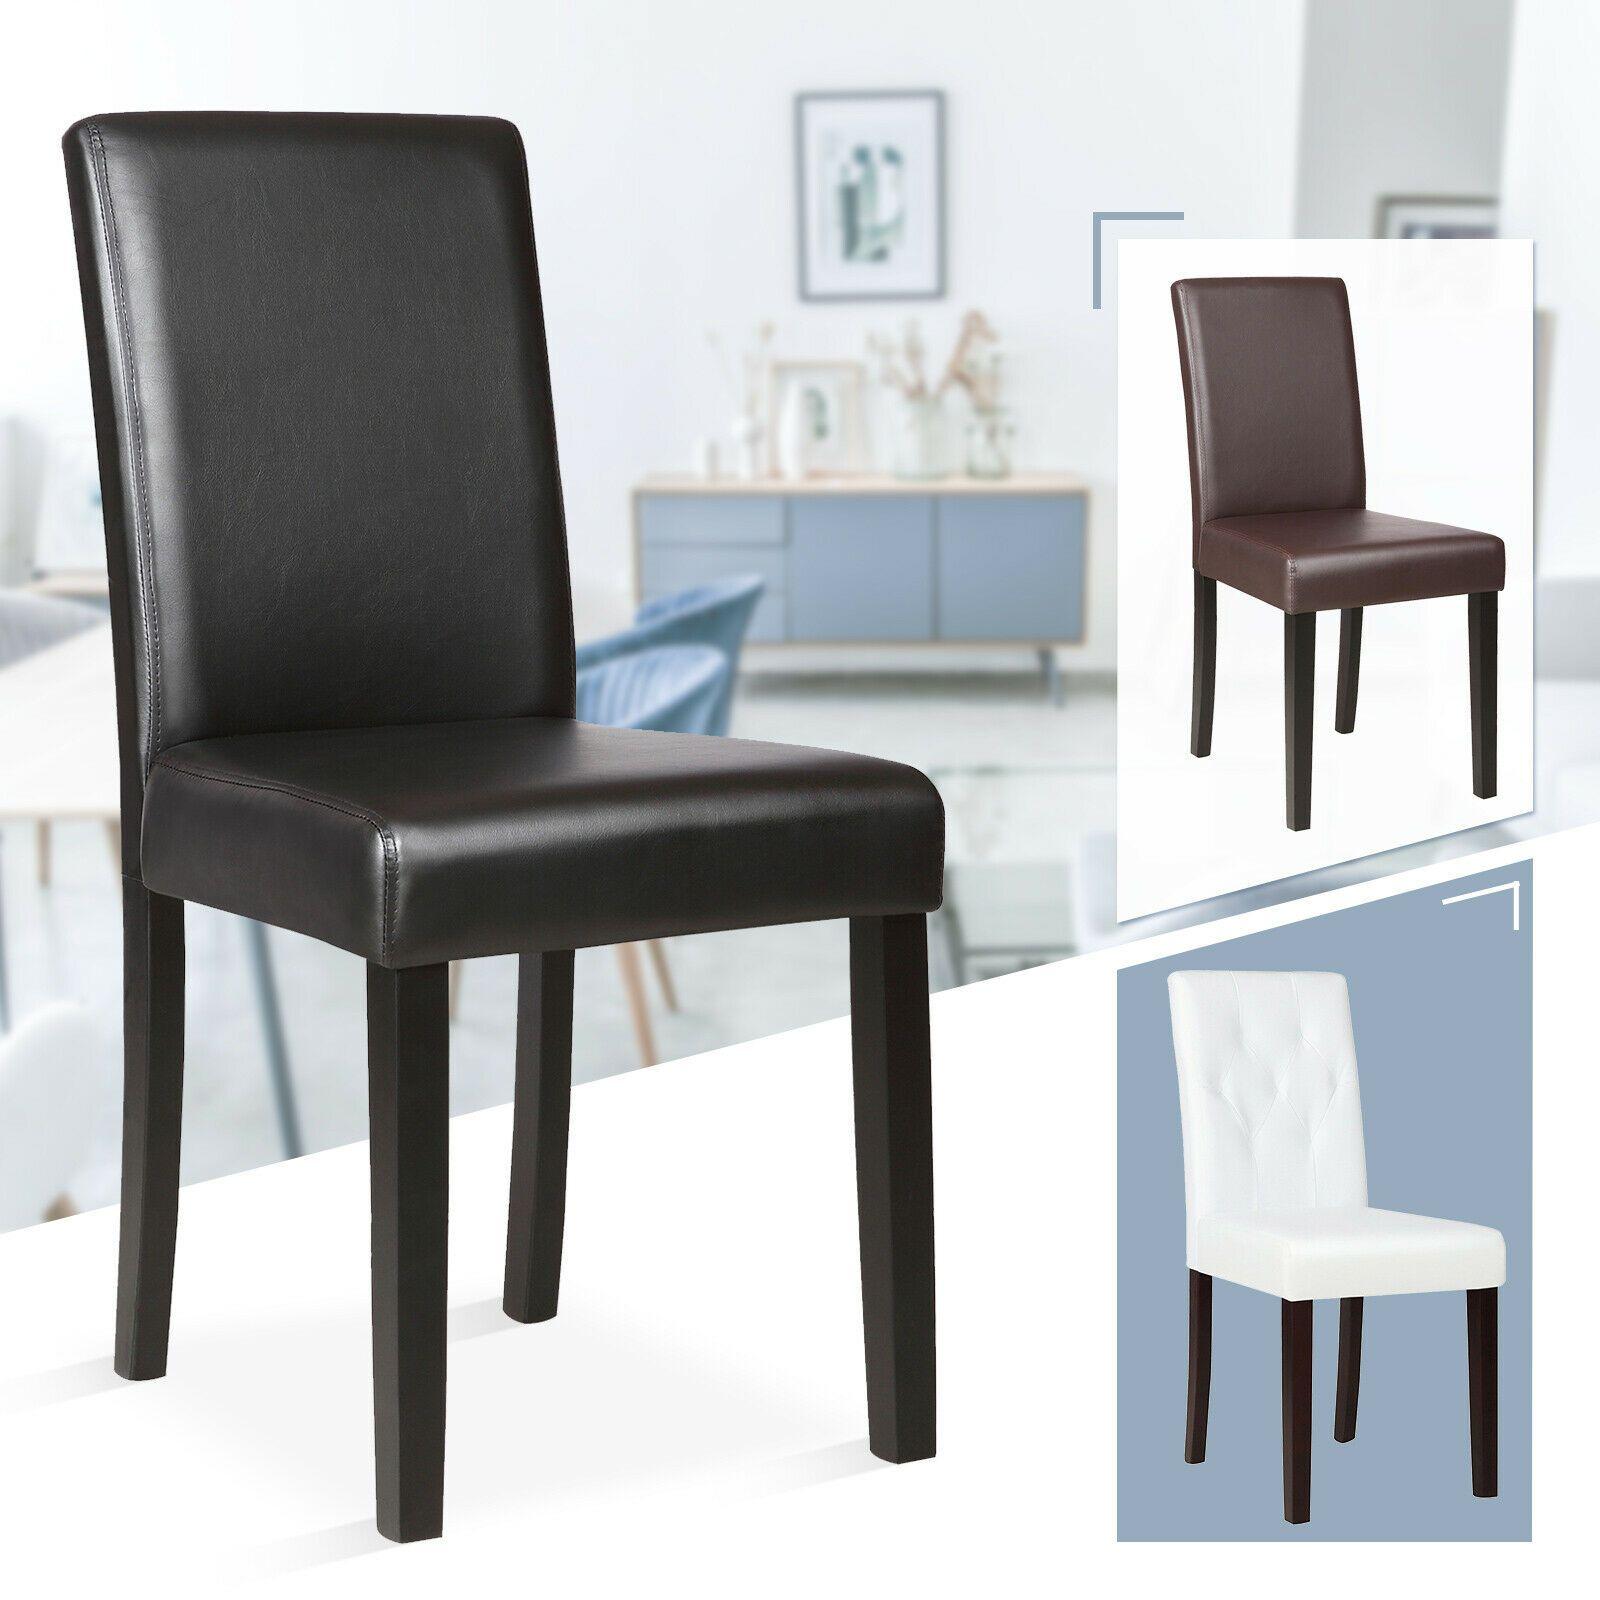 Swell Set Of 4 8 12 Pcs Black Brown White Leather Elegant Design Creativecarmelina Interior Chair Design Creativecarmelinacom